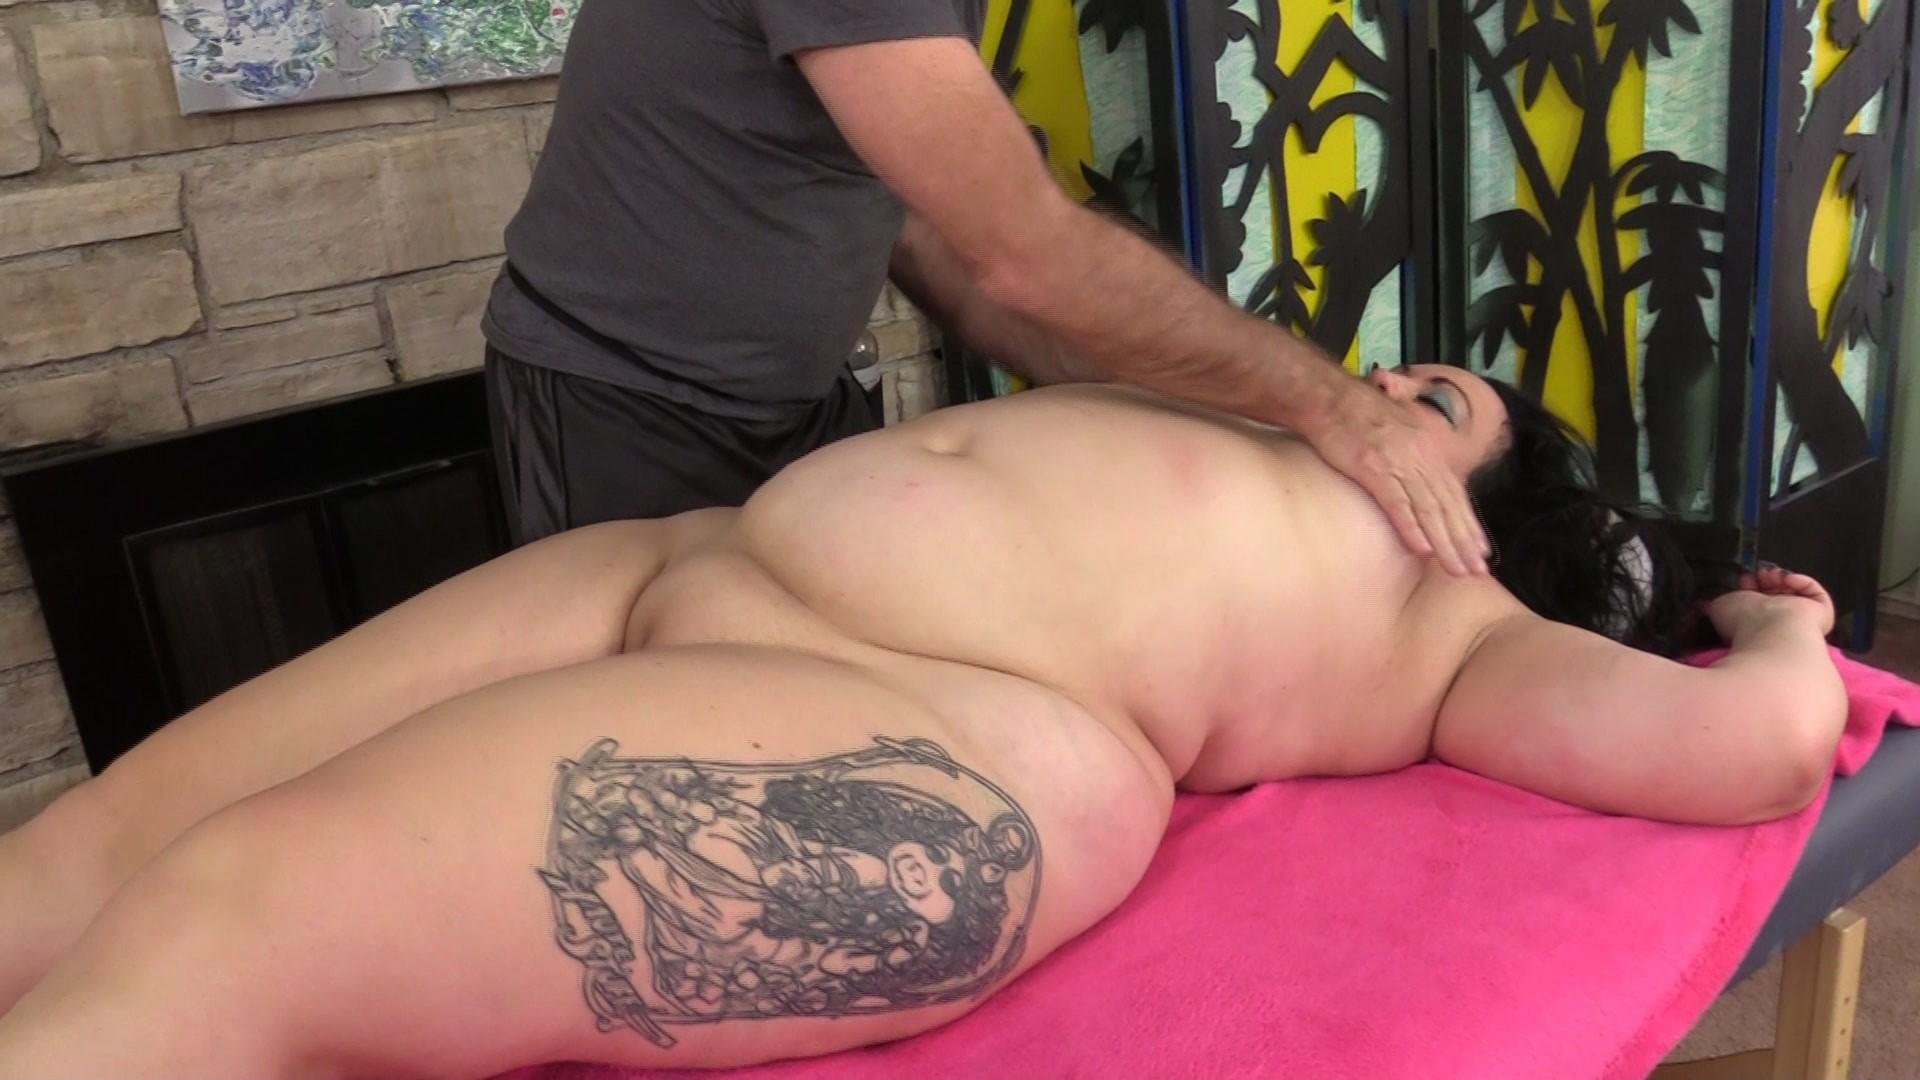 Denver colorado erotic massage hot asian sex massage gochina